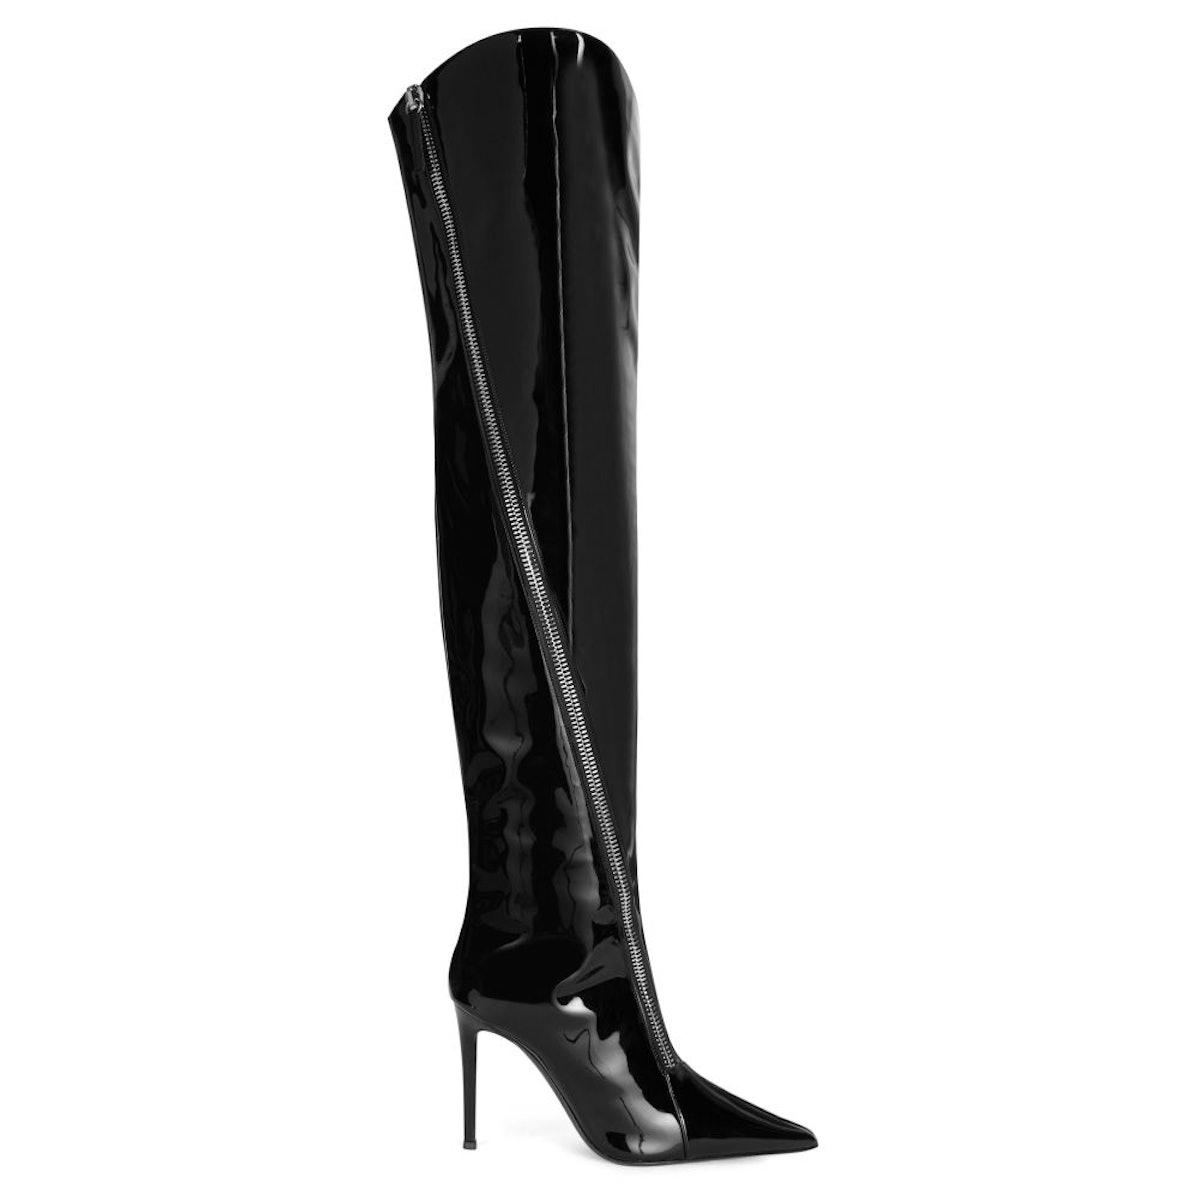 Giuseppe Zanotti black knee high boots with stiletto heel.